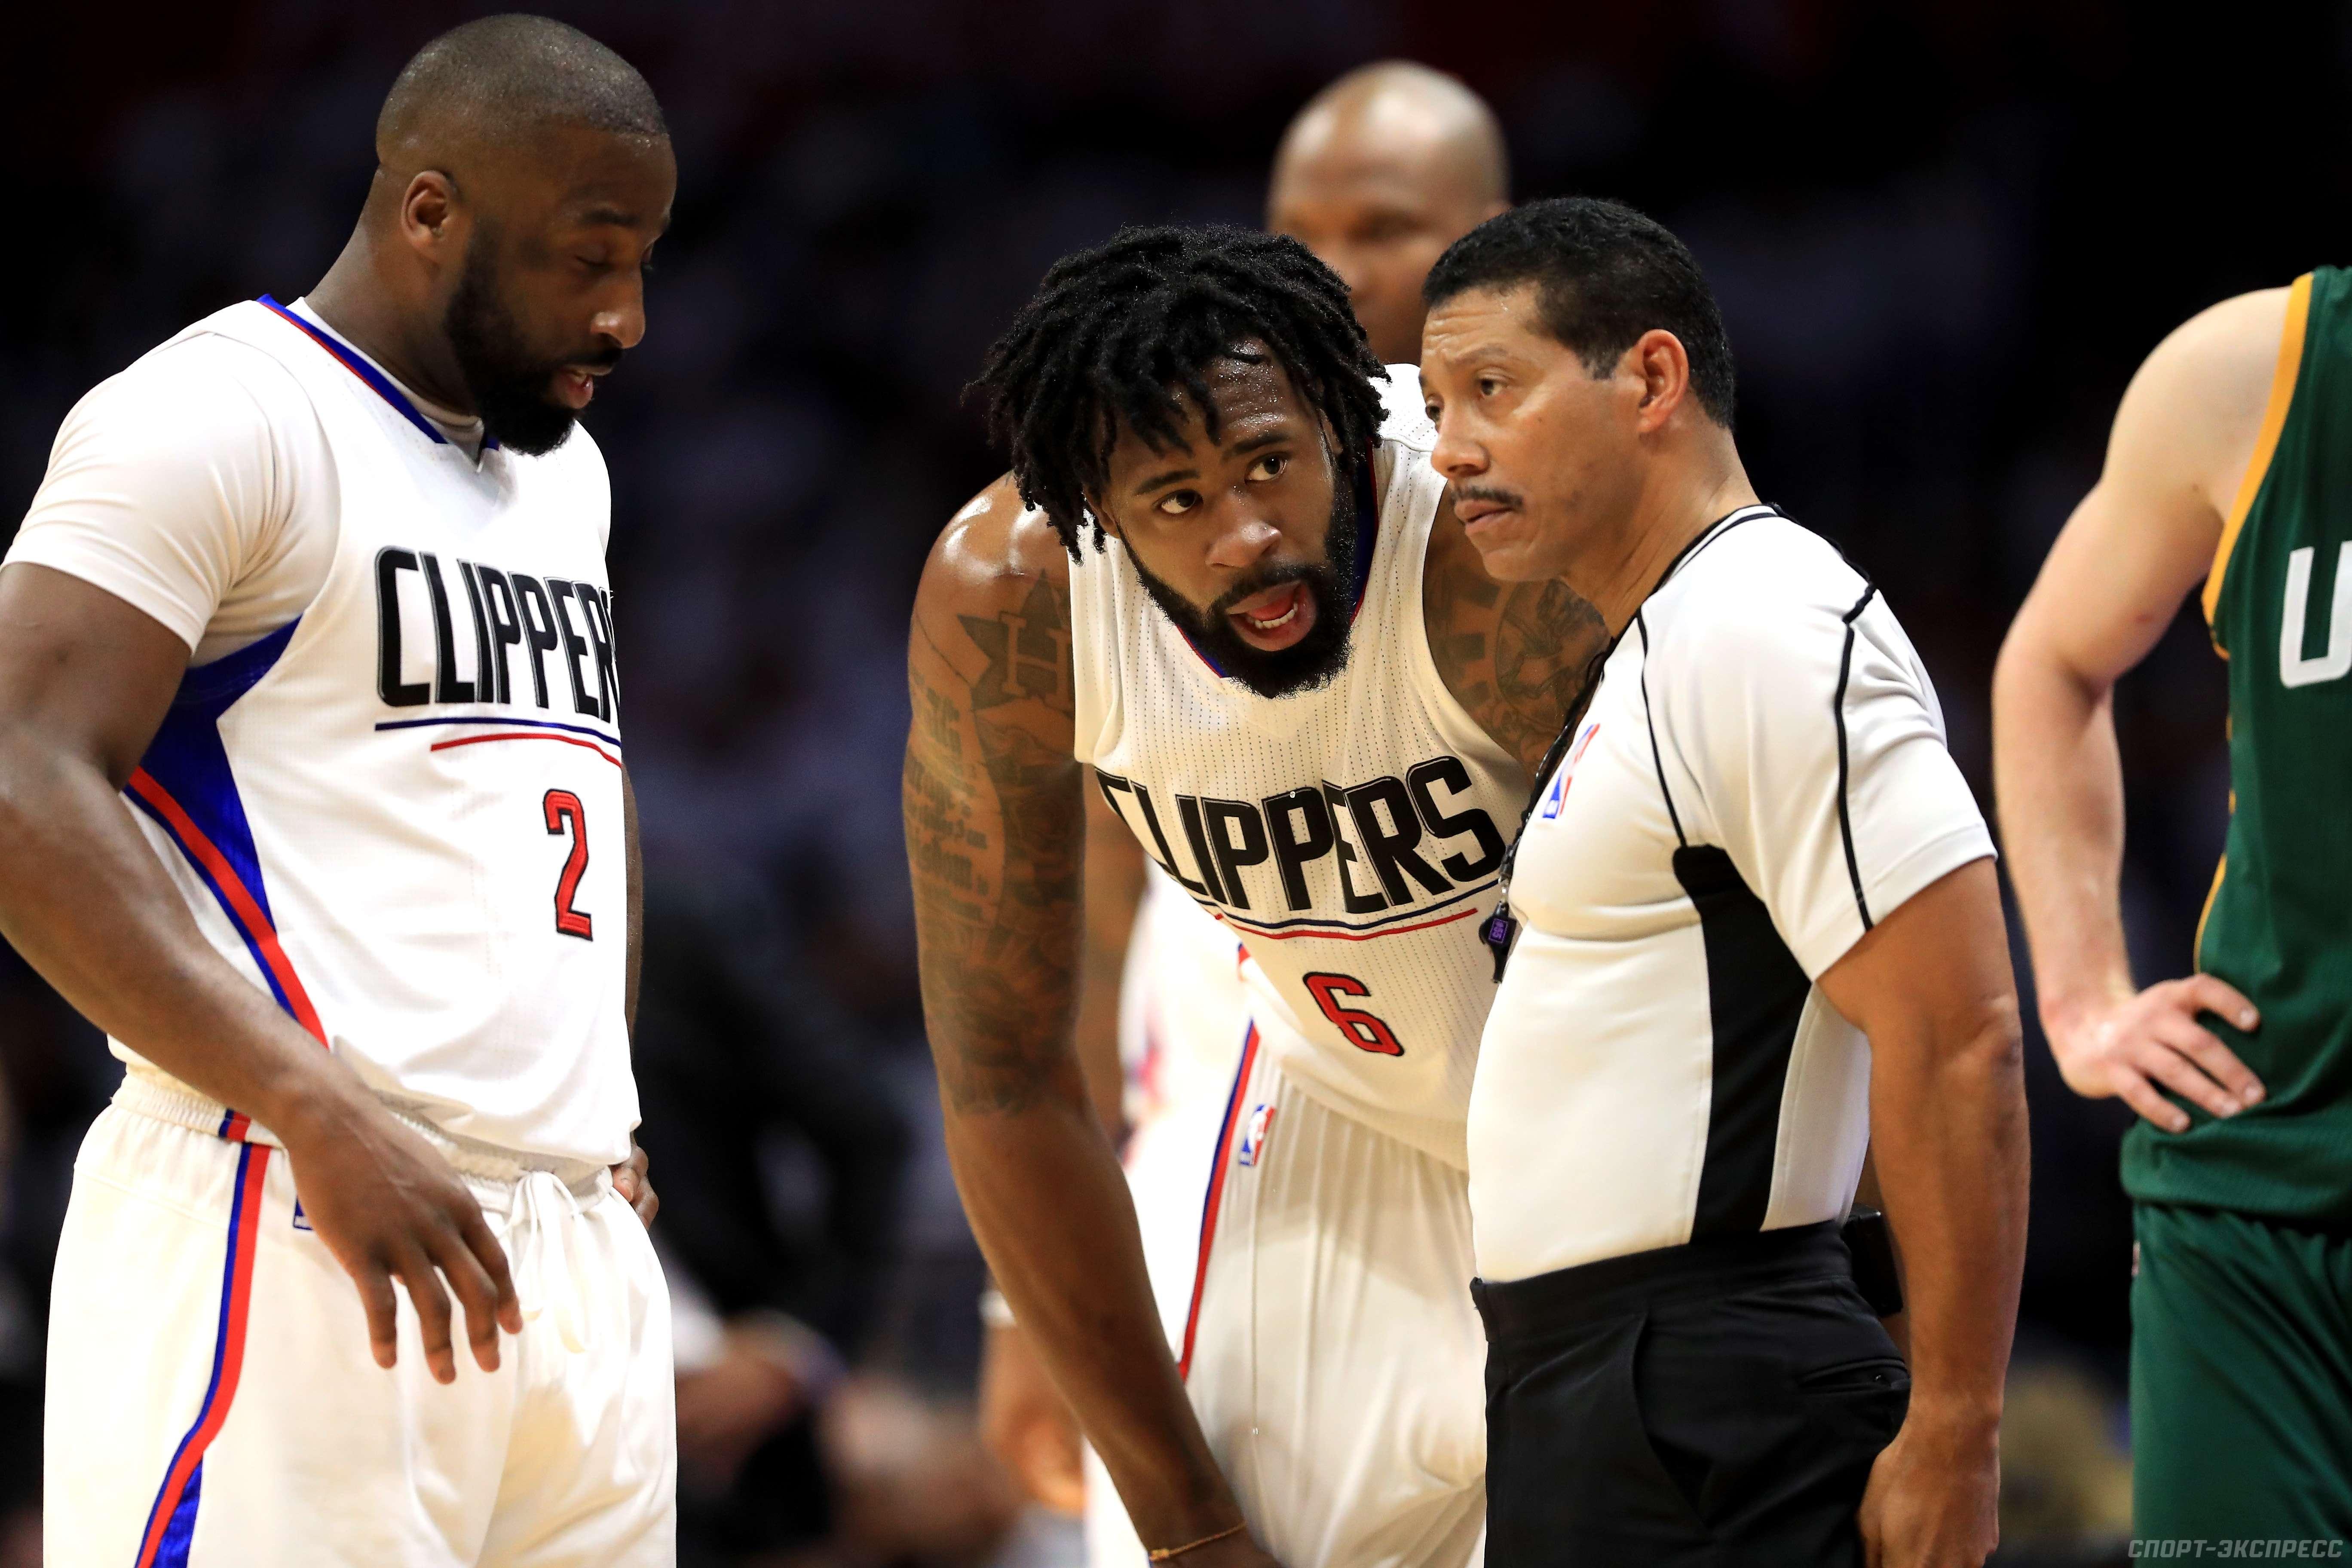 Баскетбол. Ставки на Атланта – Бруклин, Мемфис – Портленд ставки. Ставки на Плэй Офф НБА 29 Апреля